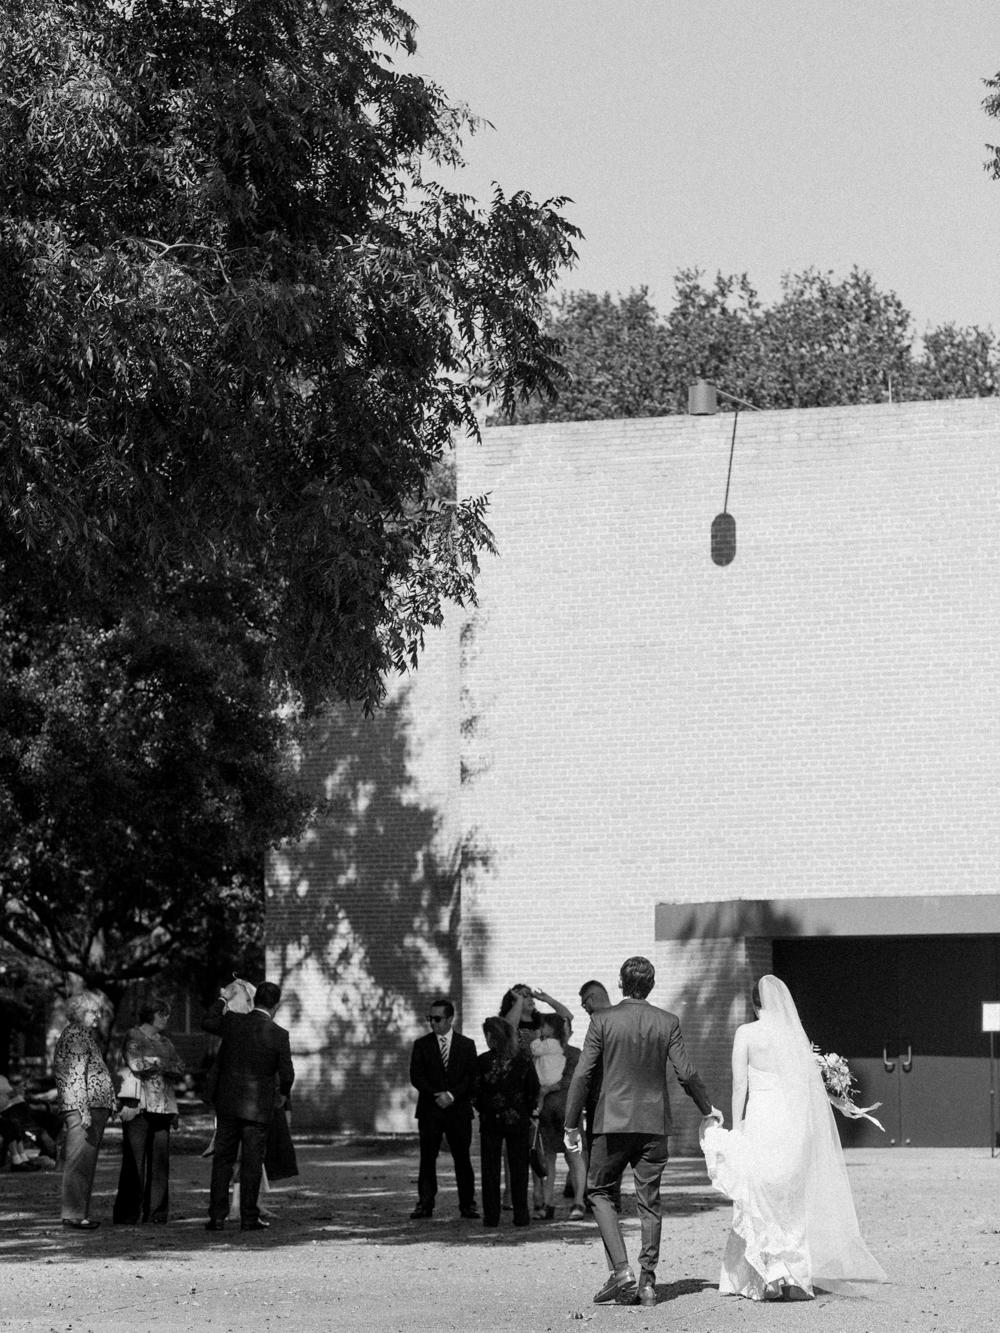 fall wedding at rothko chapel- houston wedding photographer-christine gosch - film photographer - elopement photographer- intimate wedding - lovely bride wedding gown-18.jpg